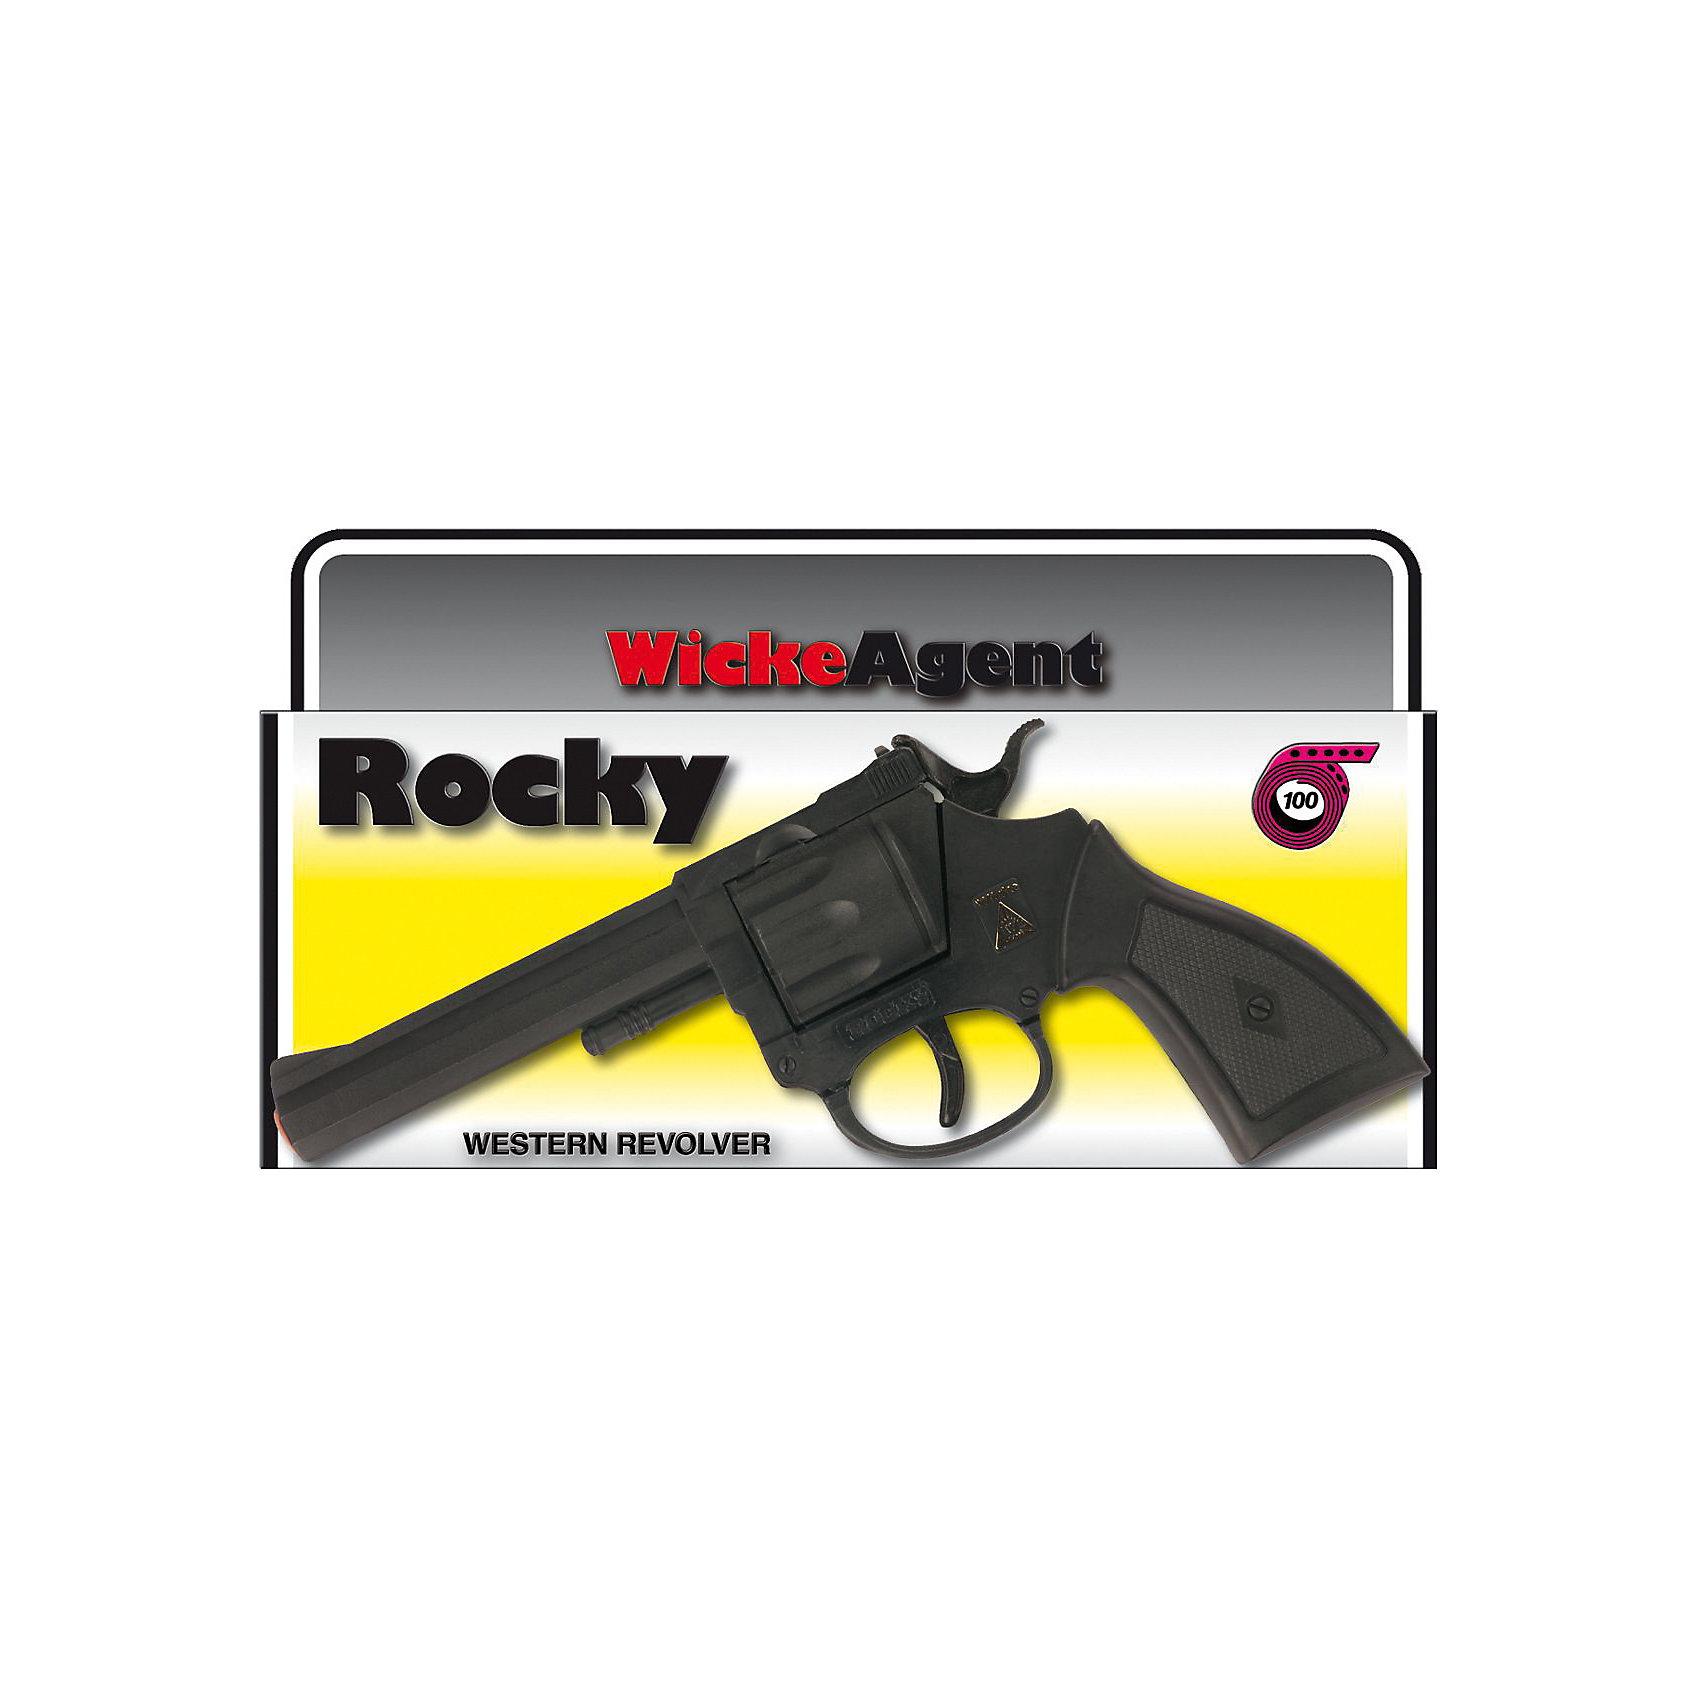 Пистолет Rocky, 100-зарядный,  Sohni-Wicke